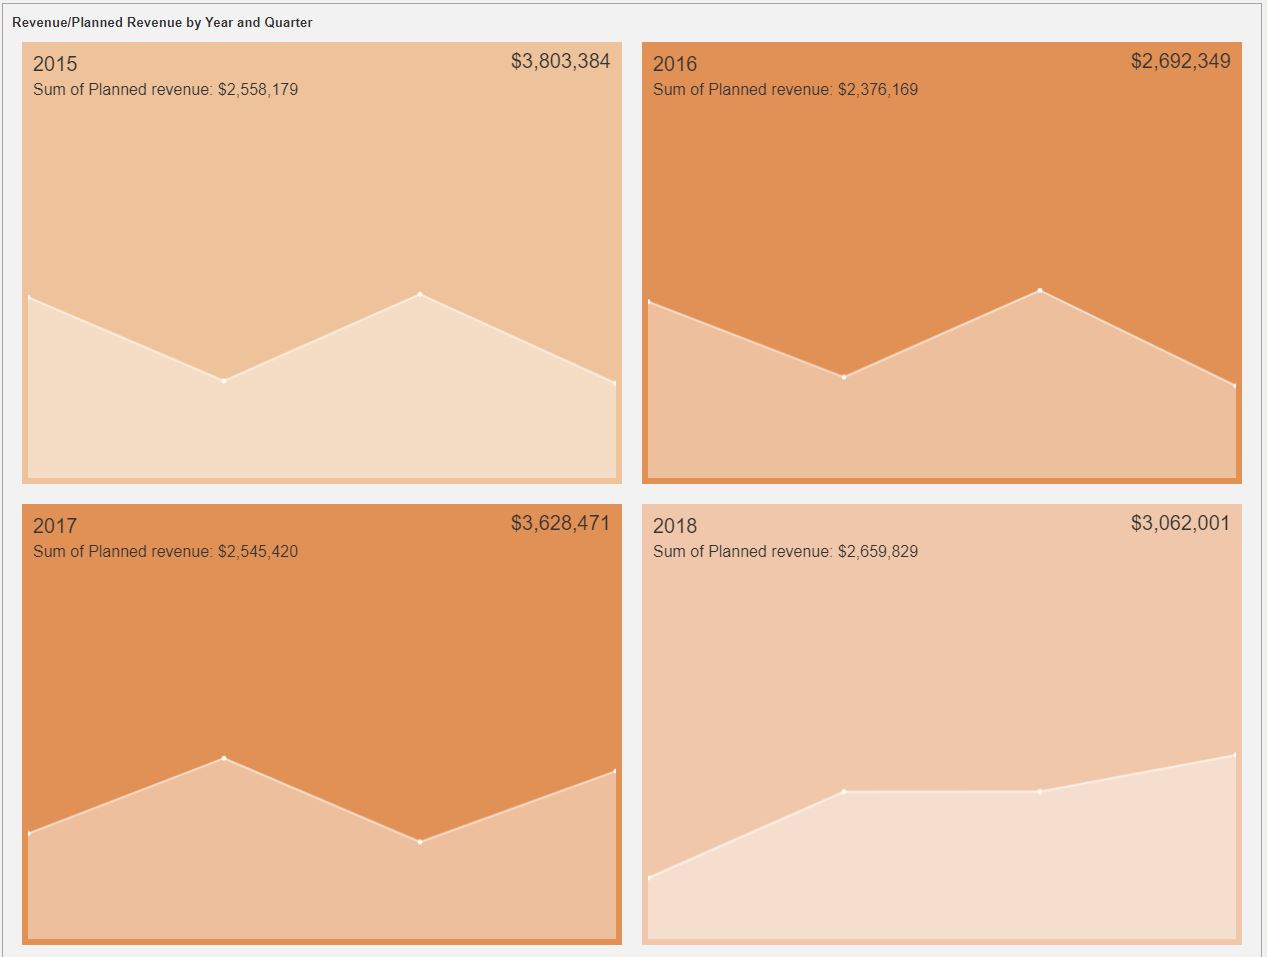 Embedded Business Intelligence Data Visualizations - KPI Cards